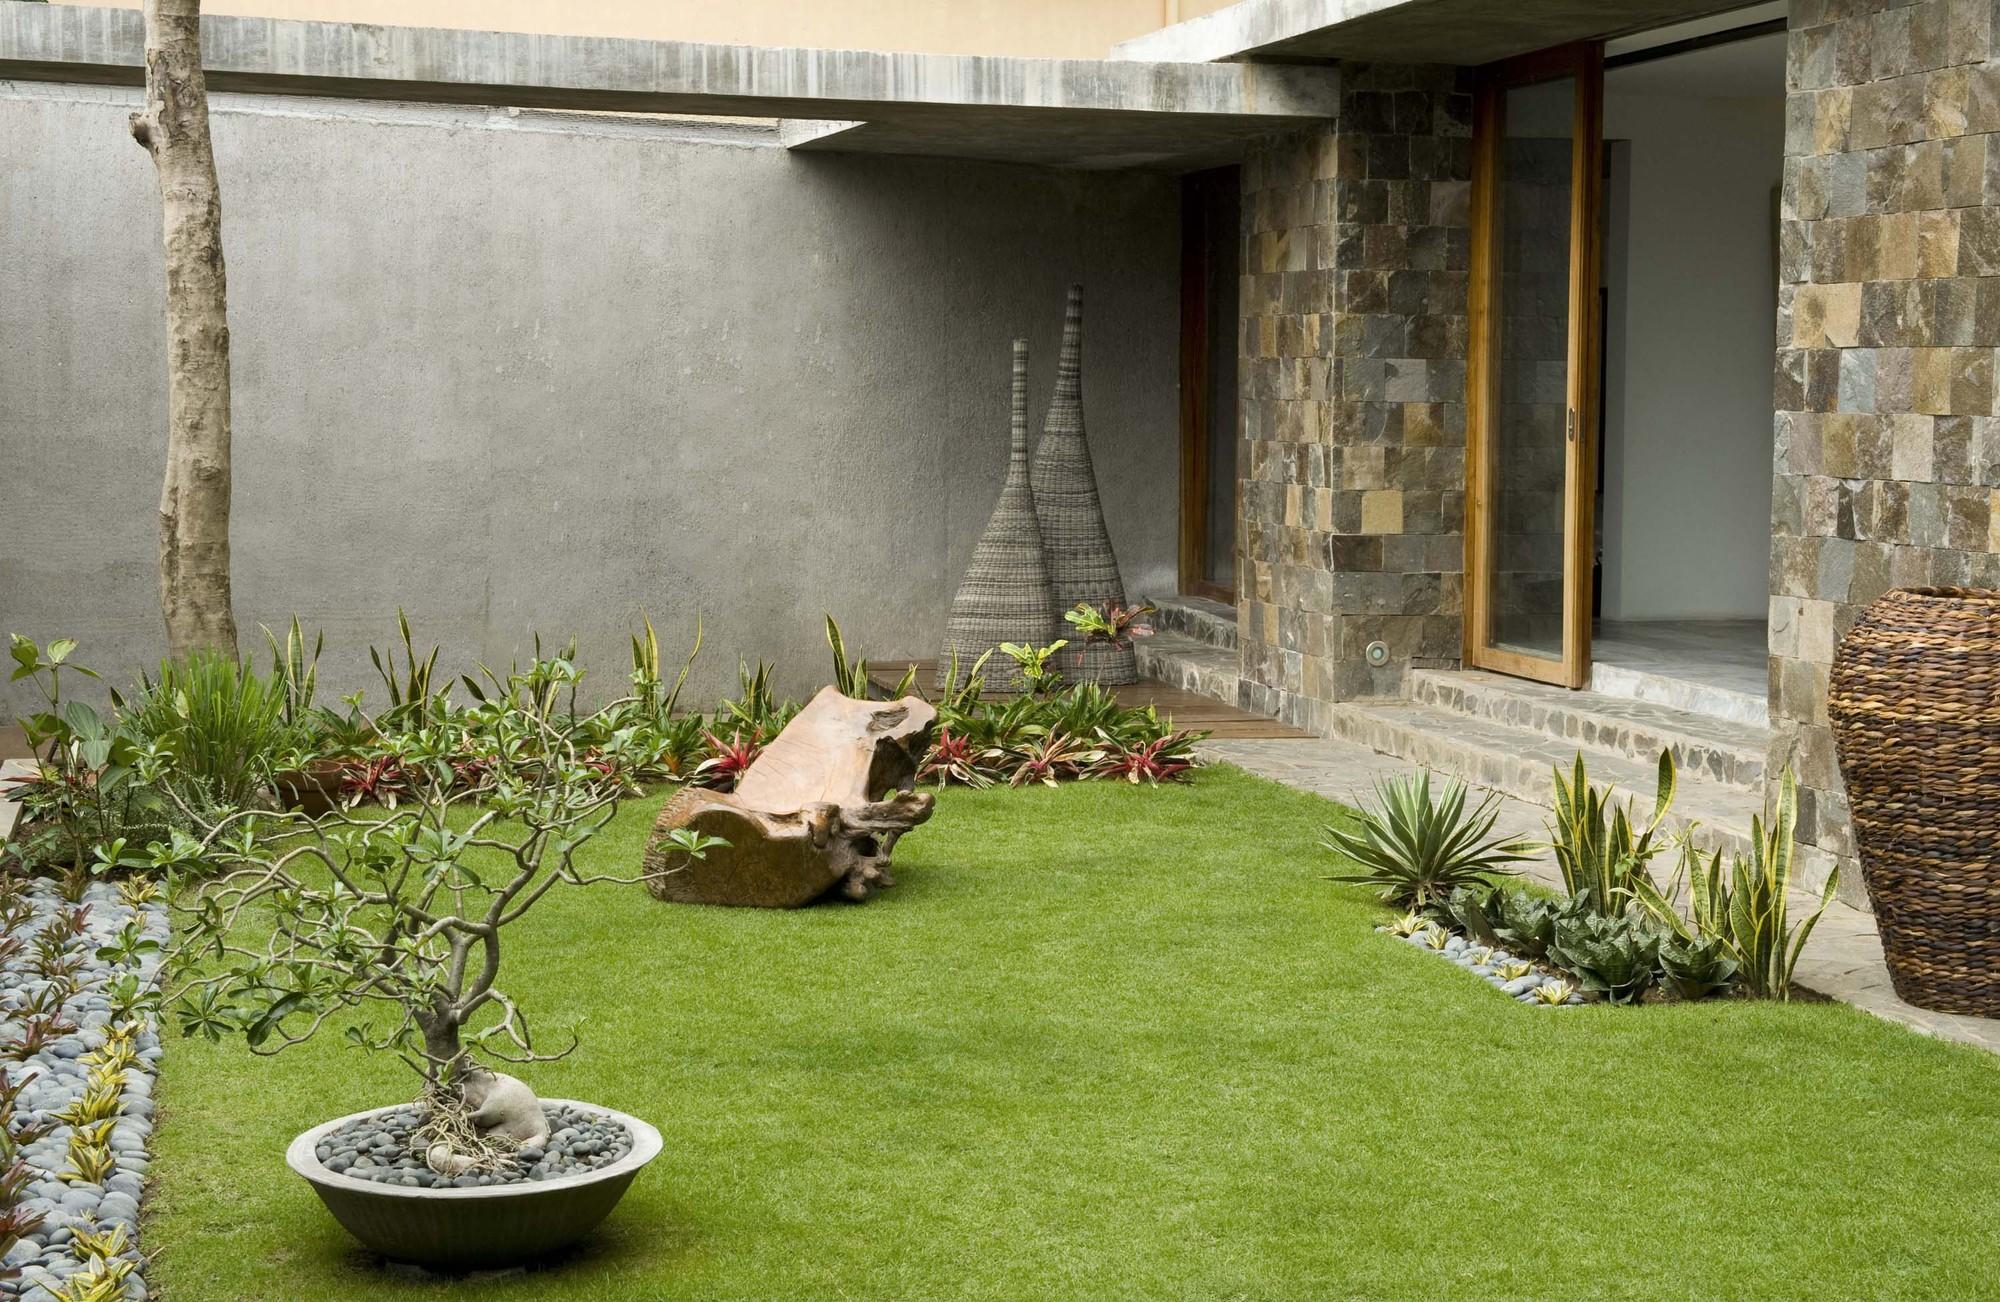 Dise o de casa r stica fachada interiores y planos for Diseno de jardines frentes de casas